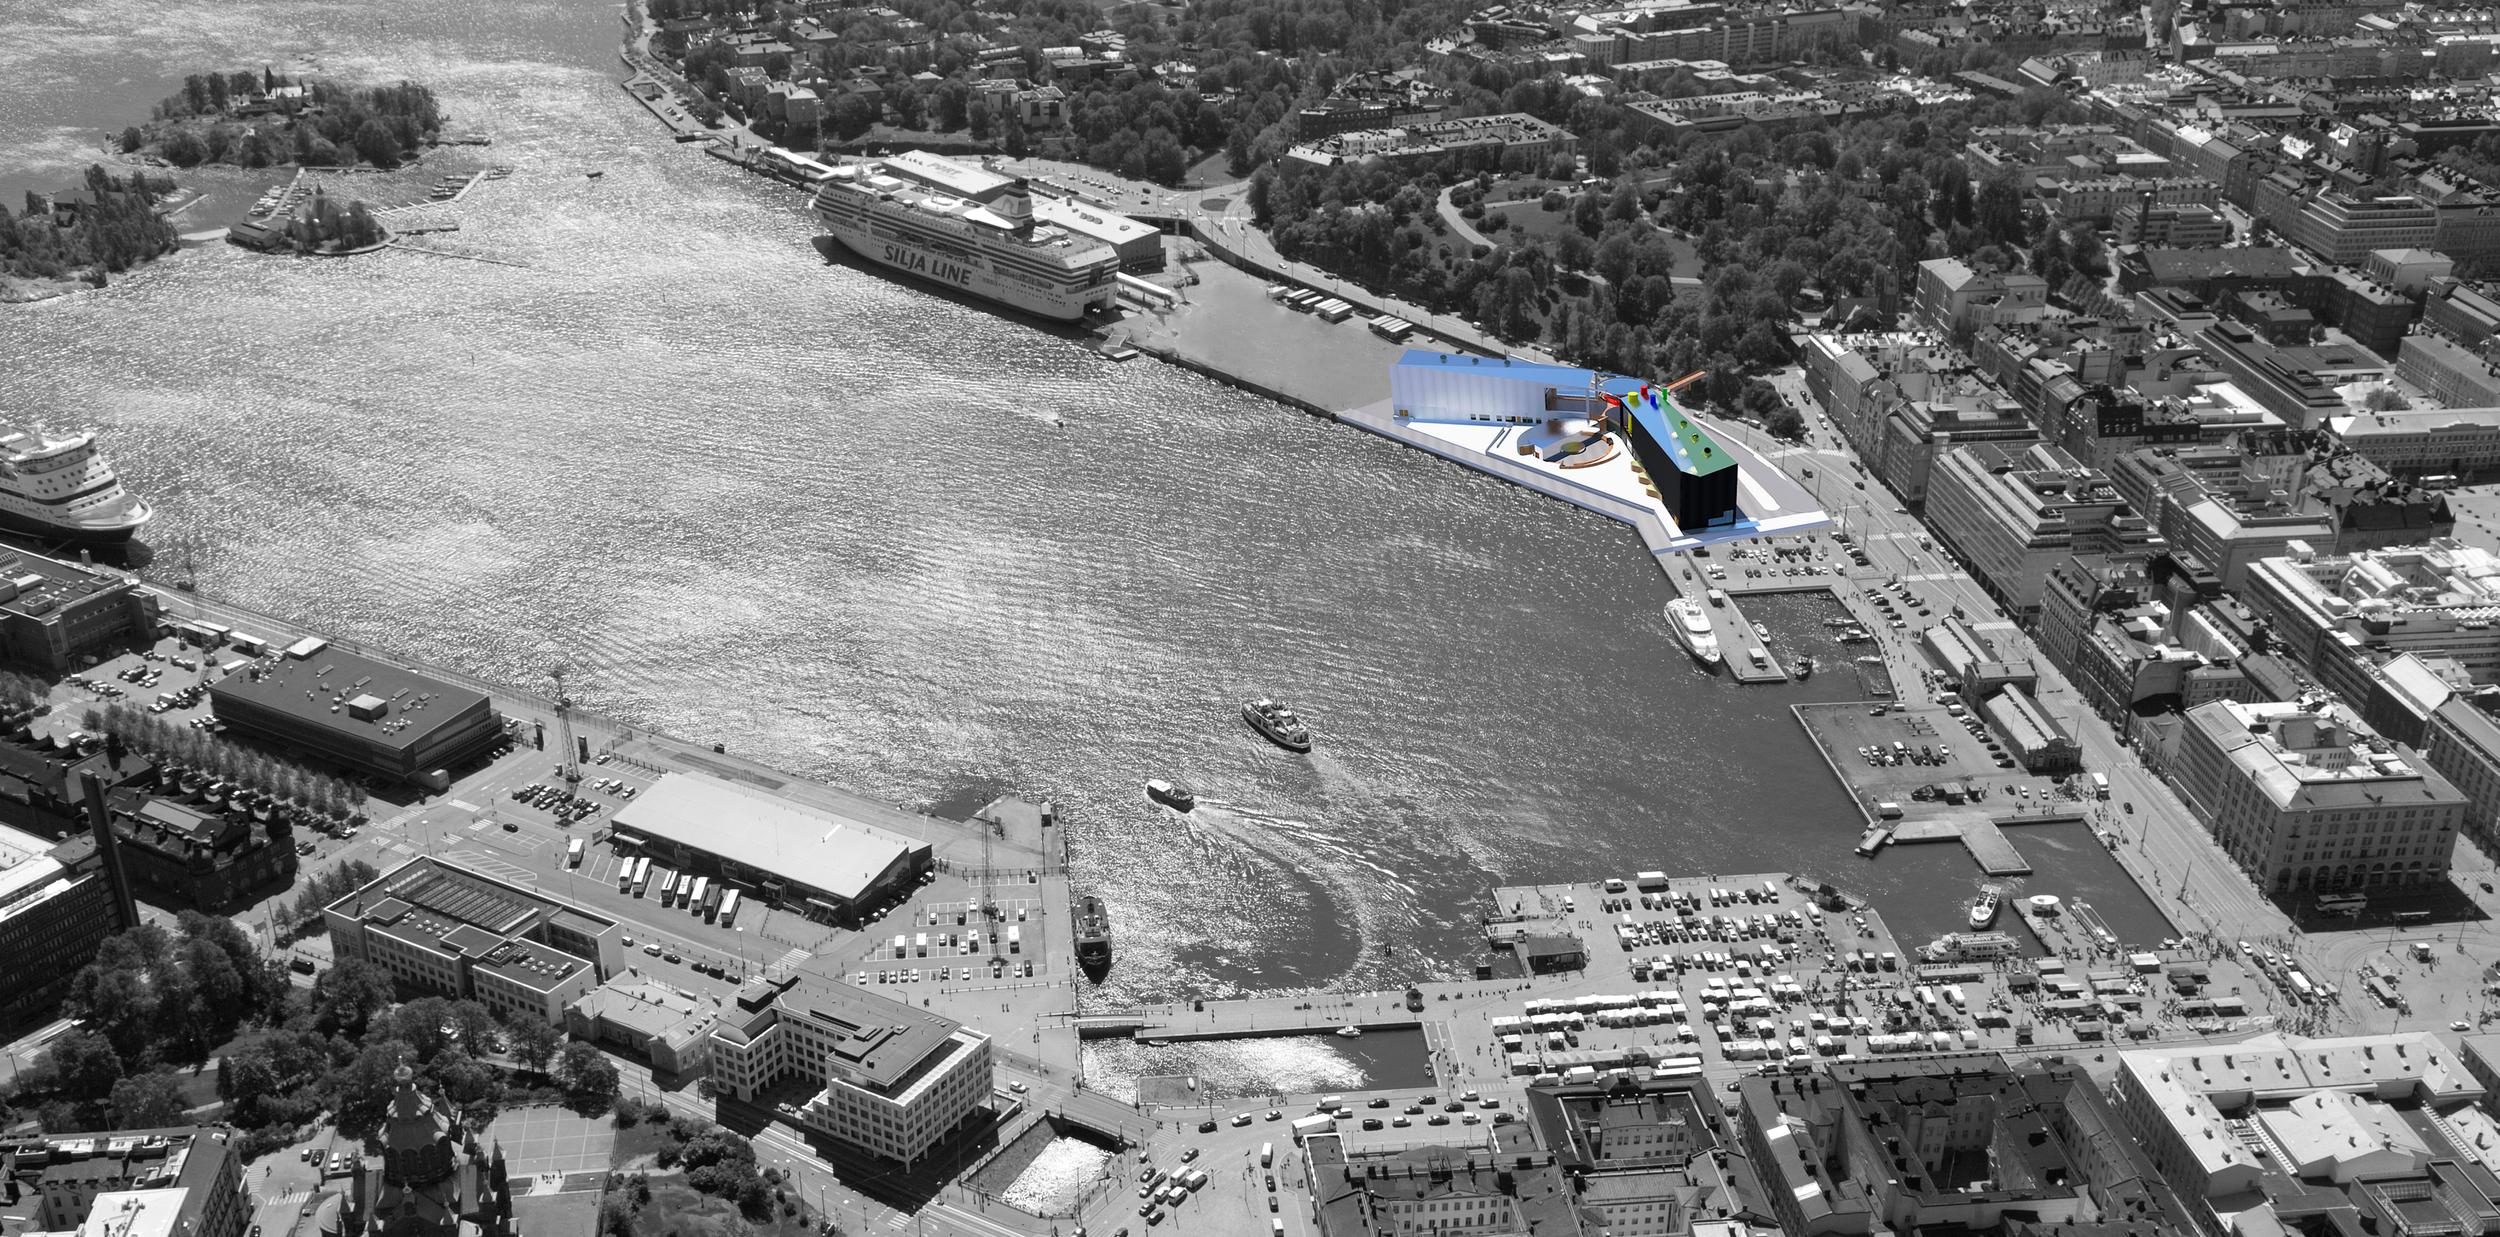 Guggenheim_Aerial.jpg